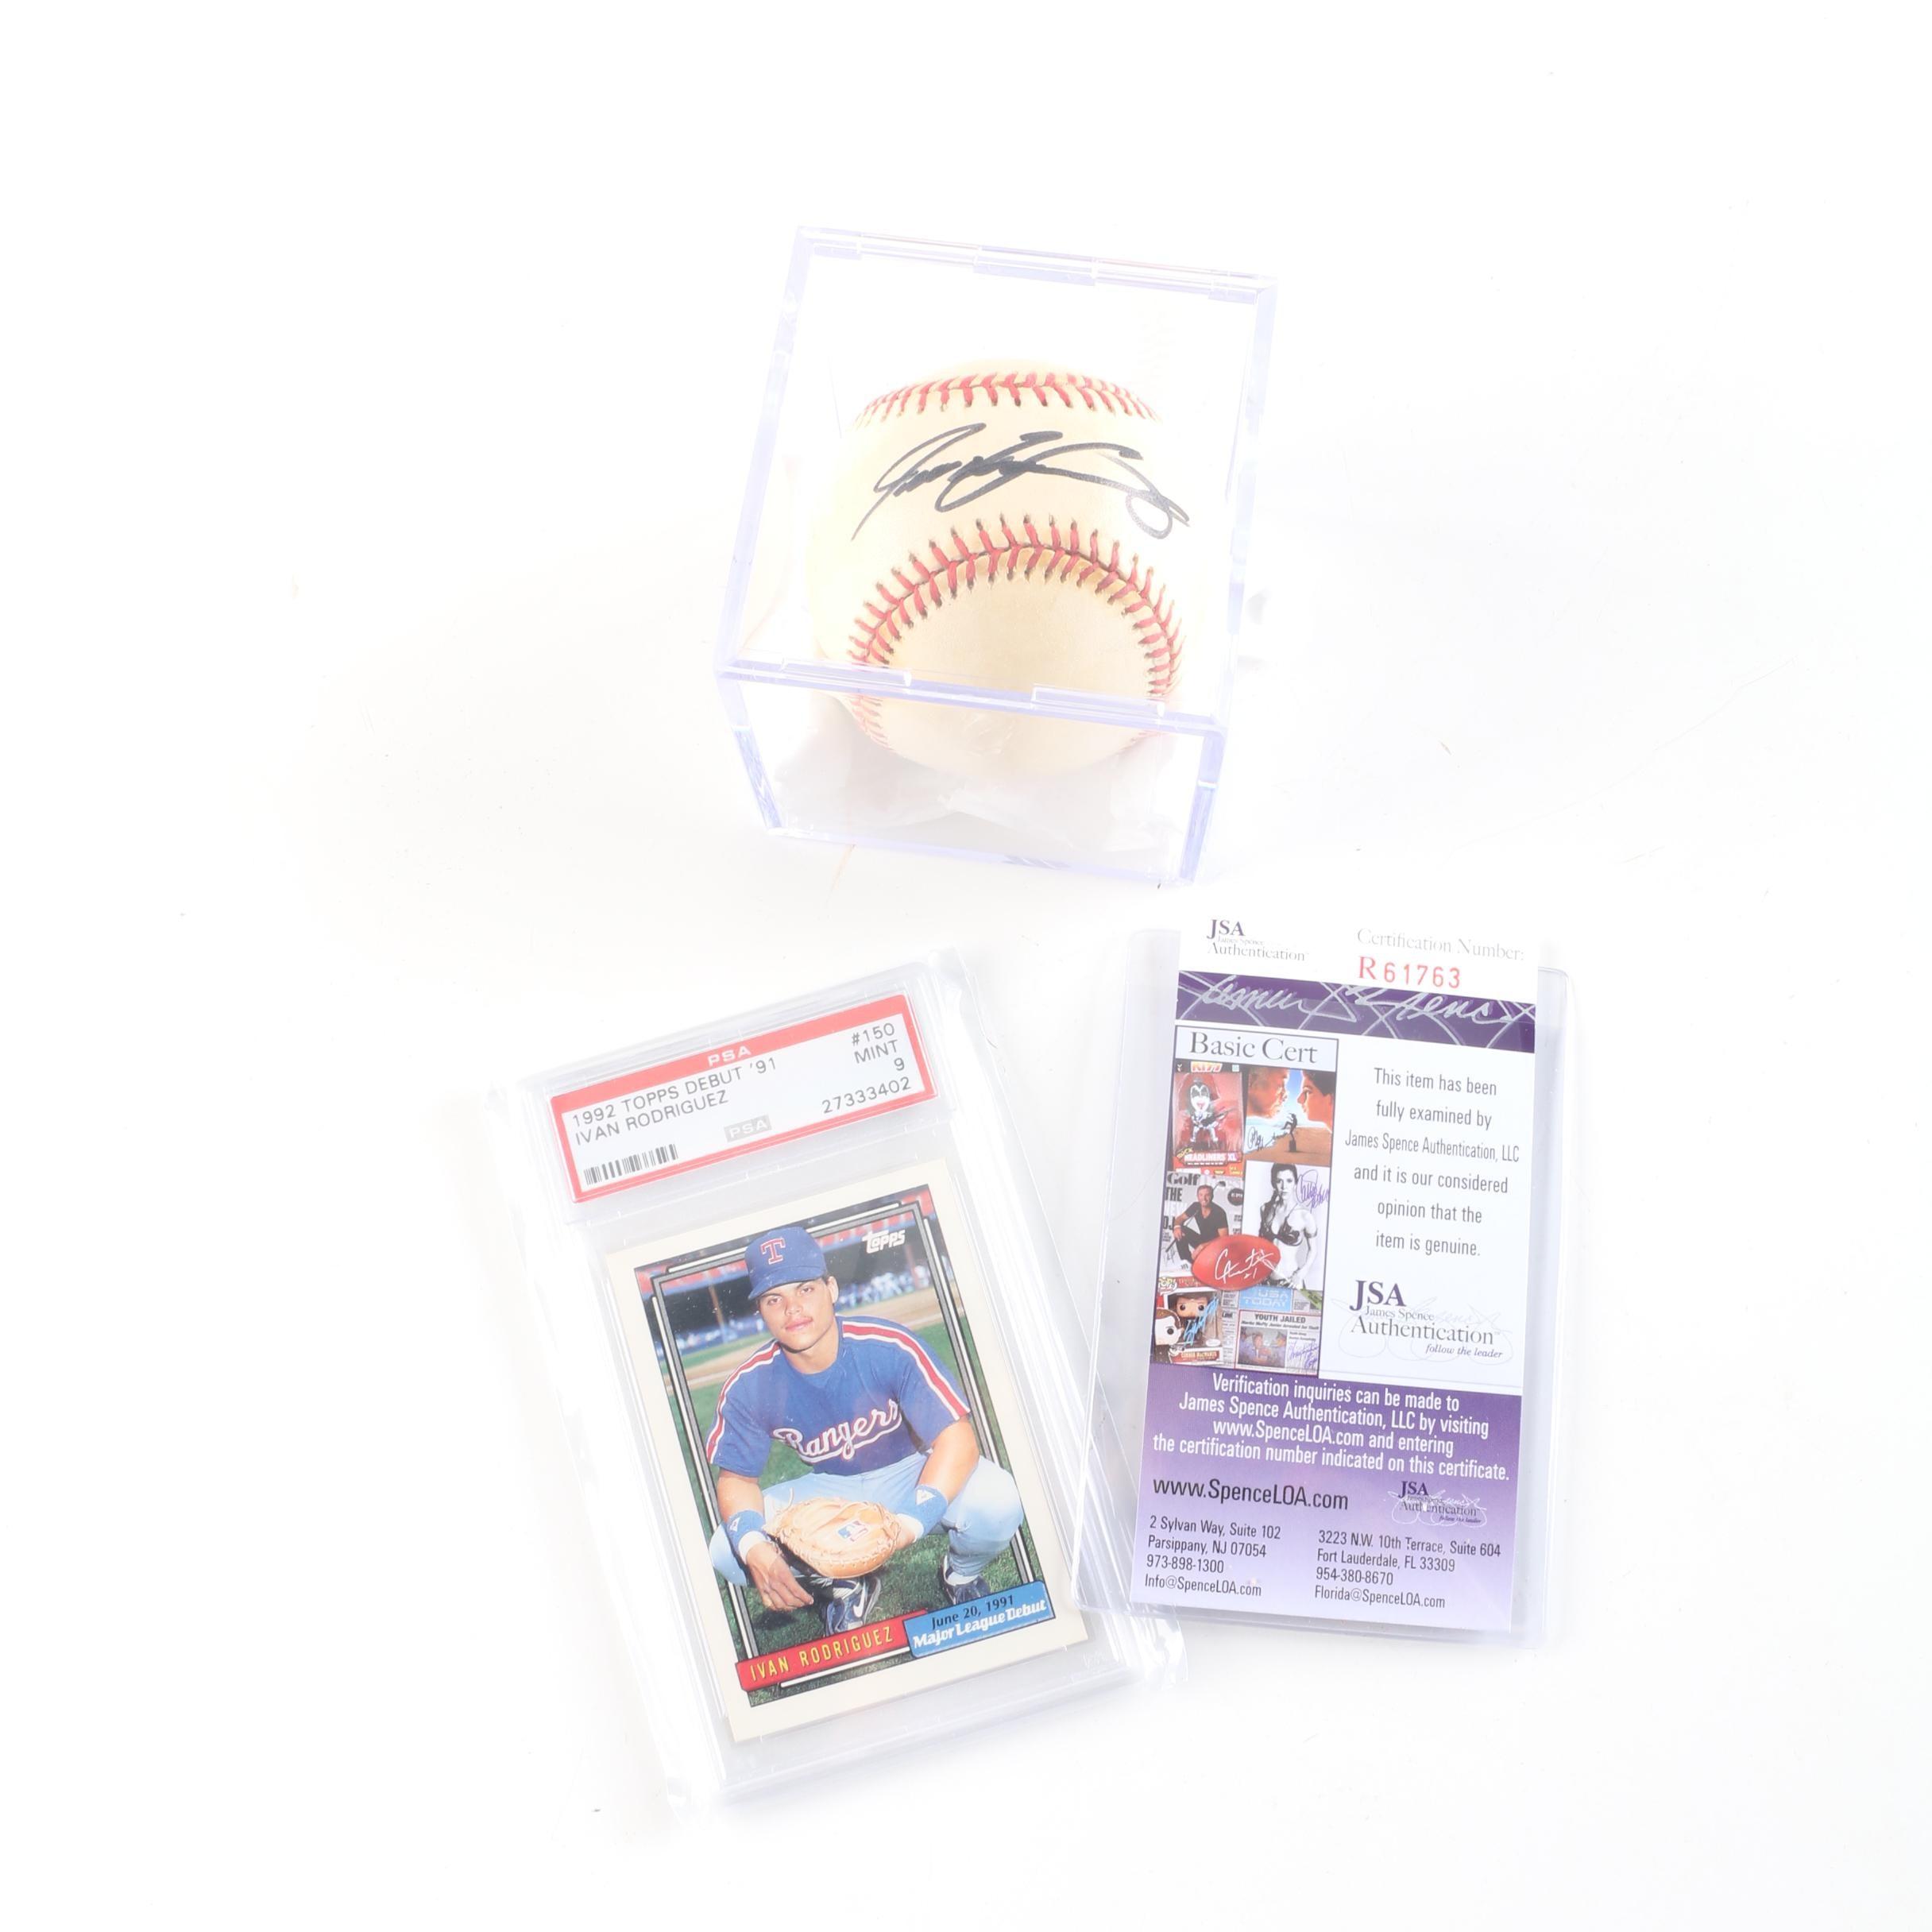 Ivan Rodriguez Autographed Baseball With JSA COA and PSA Graded Card